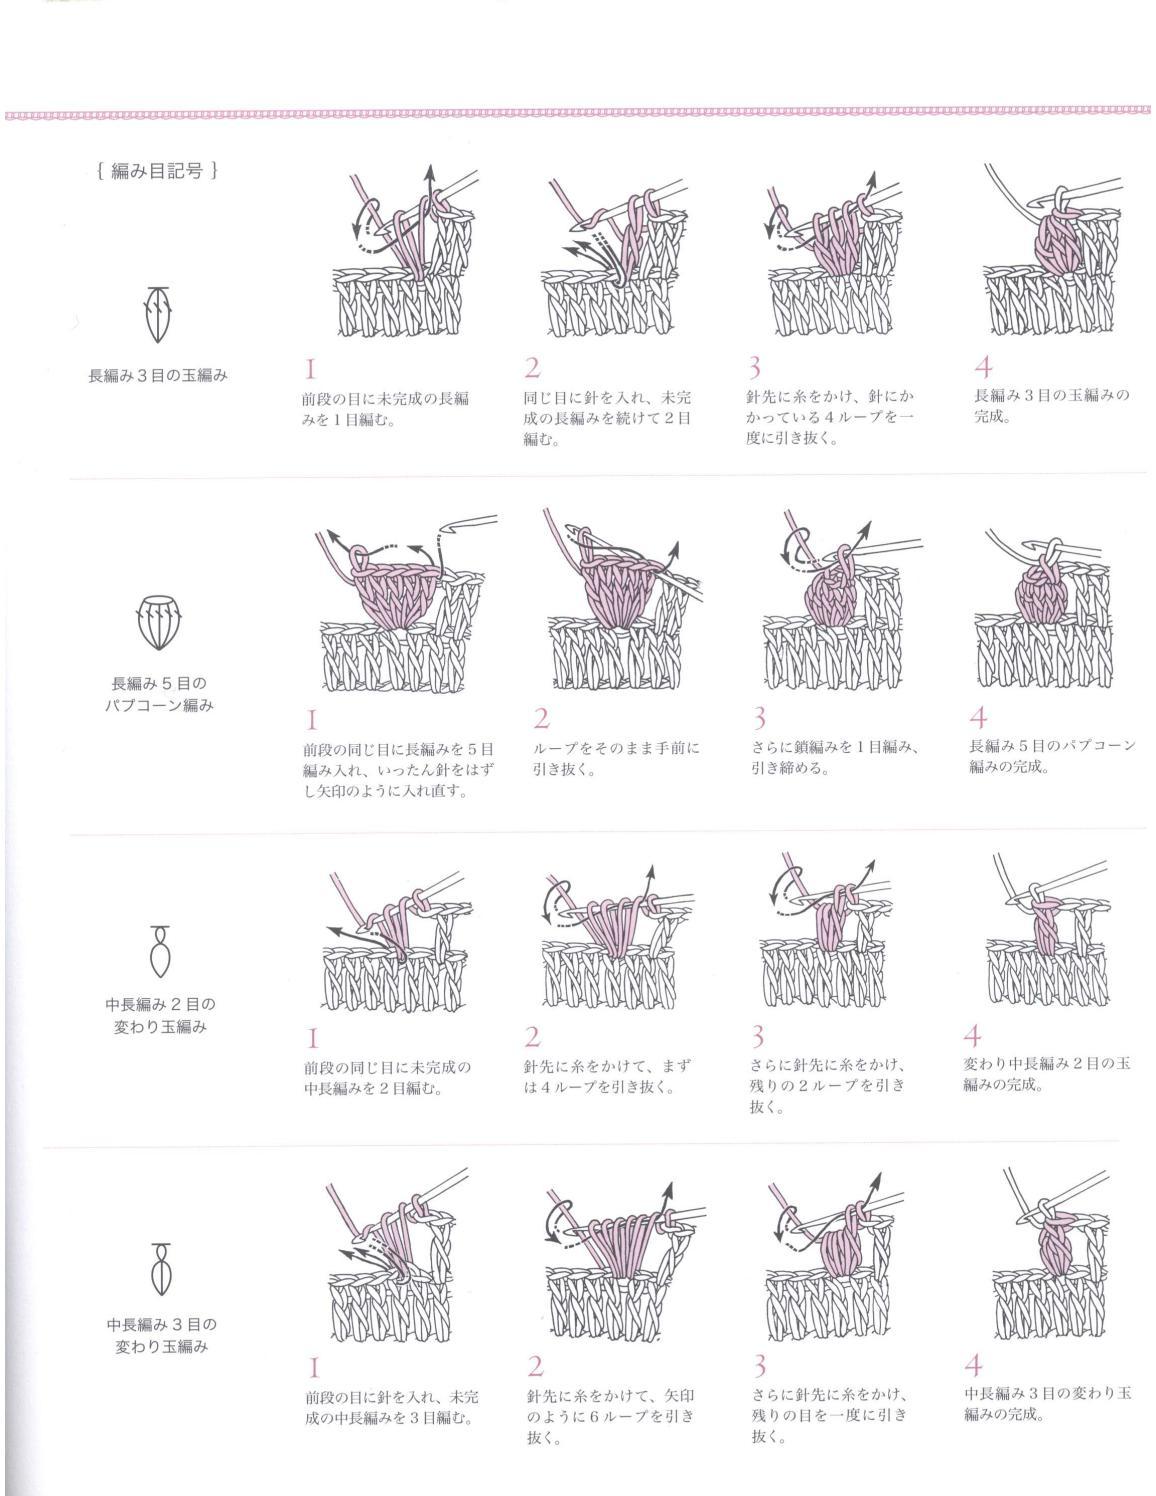 Asahi original crochet best selection 2012 page 95